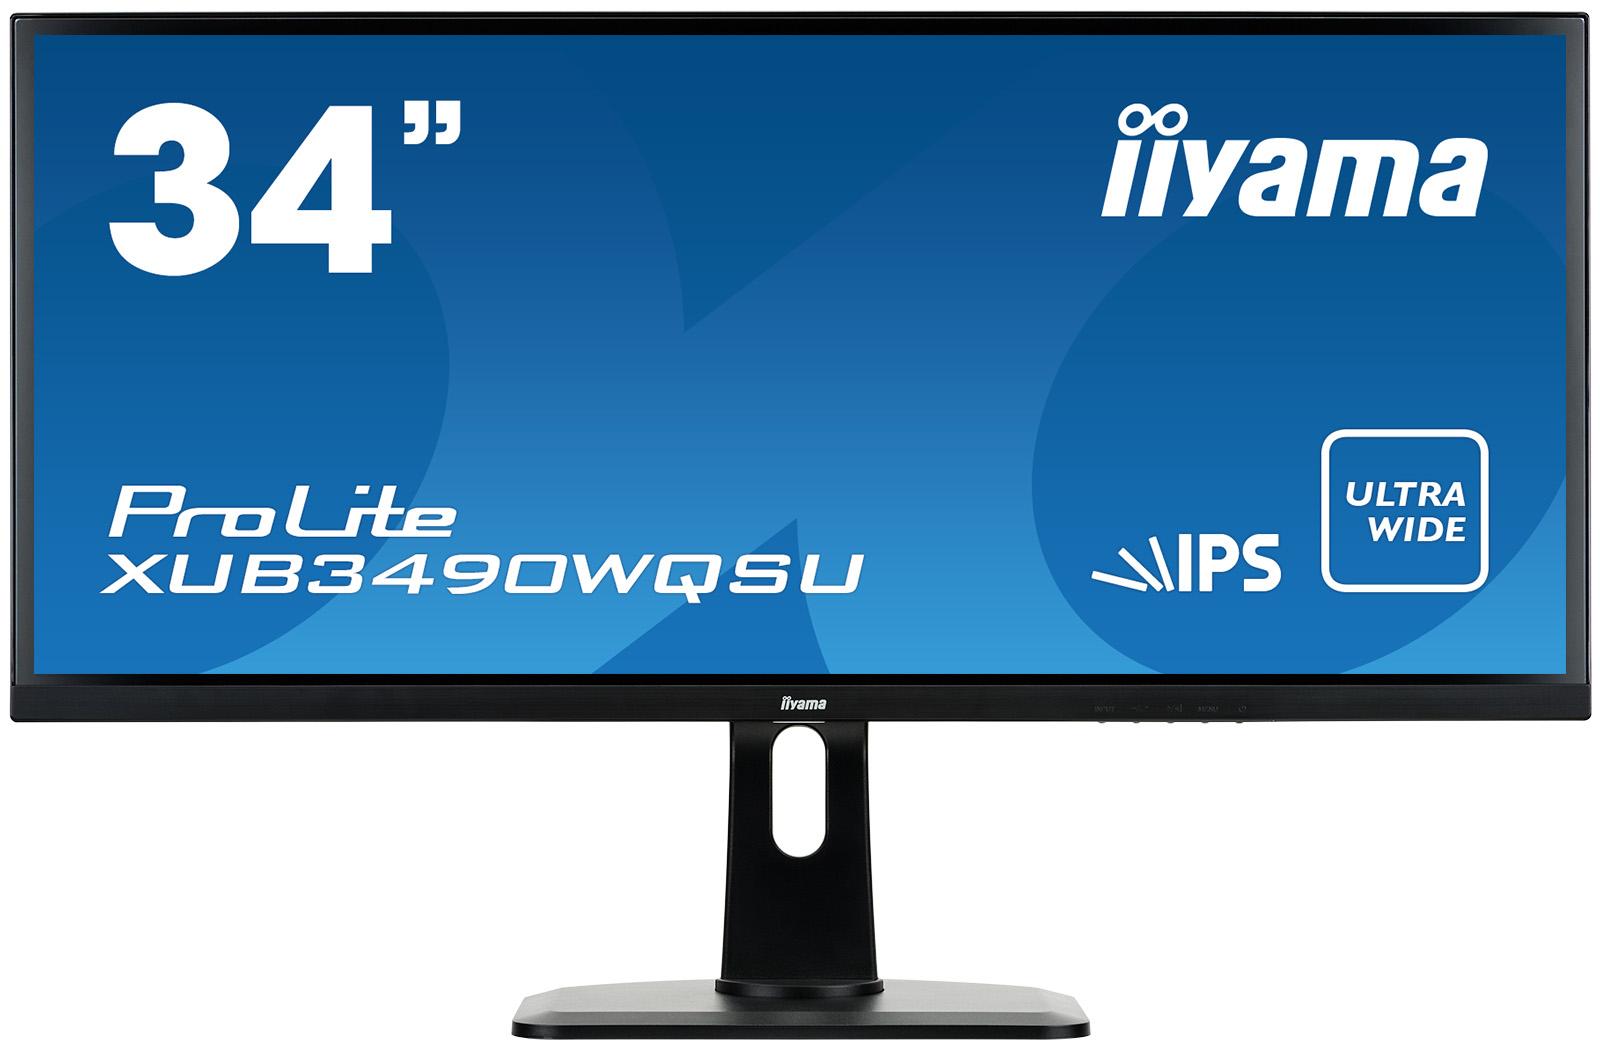 Iiyama LCD XUB3490WQSU-B1 34''LED,AH-IPS,5ms,HDMI/DP,USB,repro,3440x1440,HAS,č